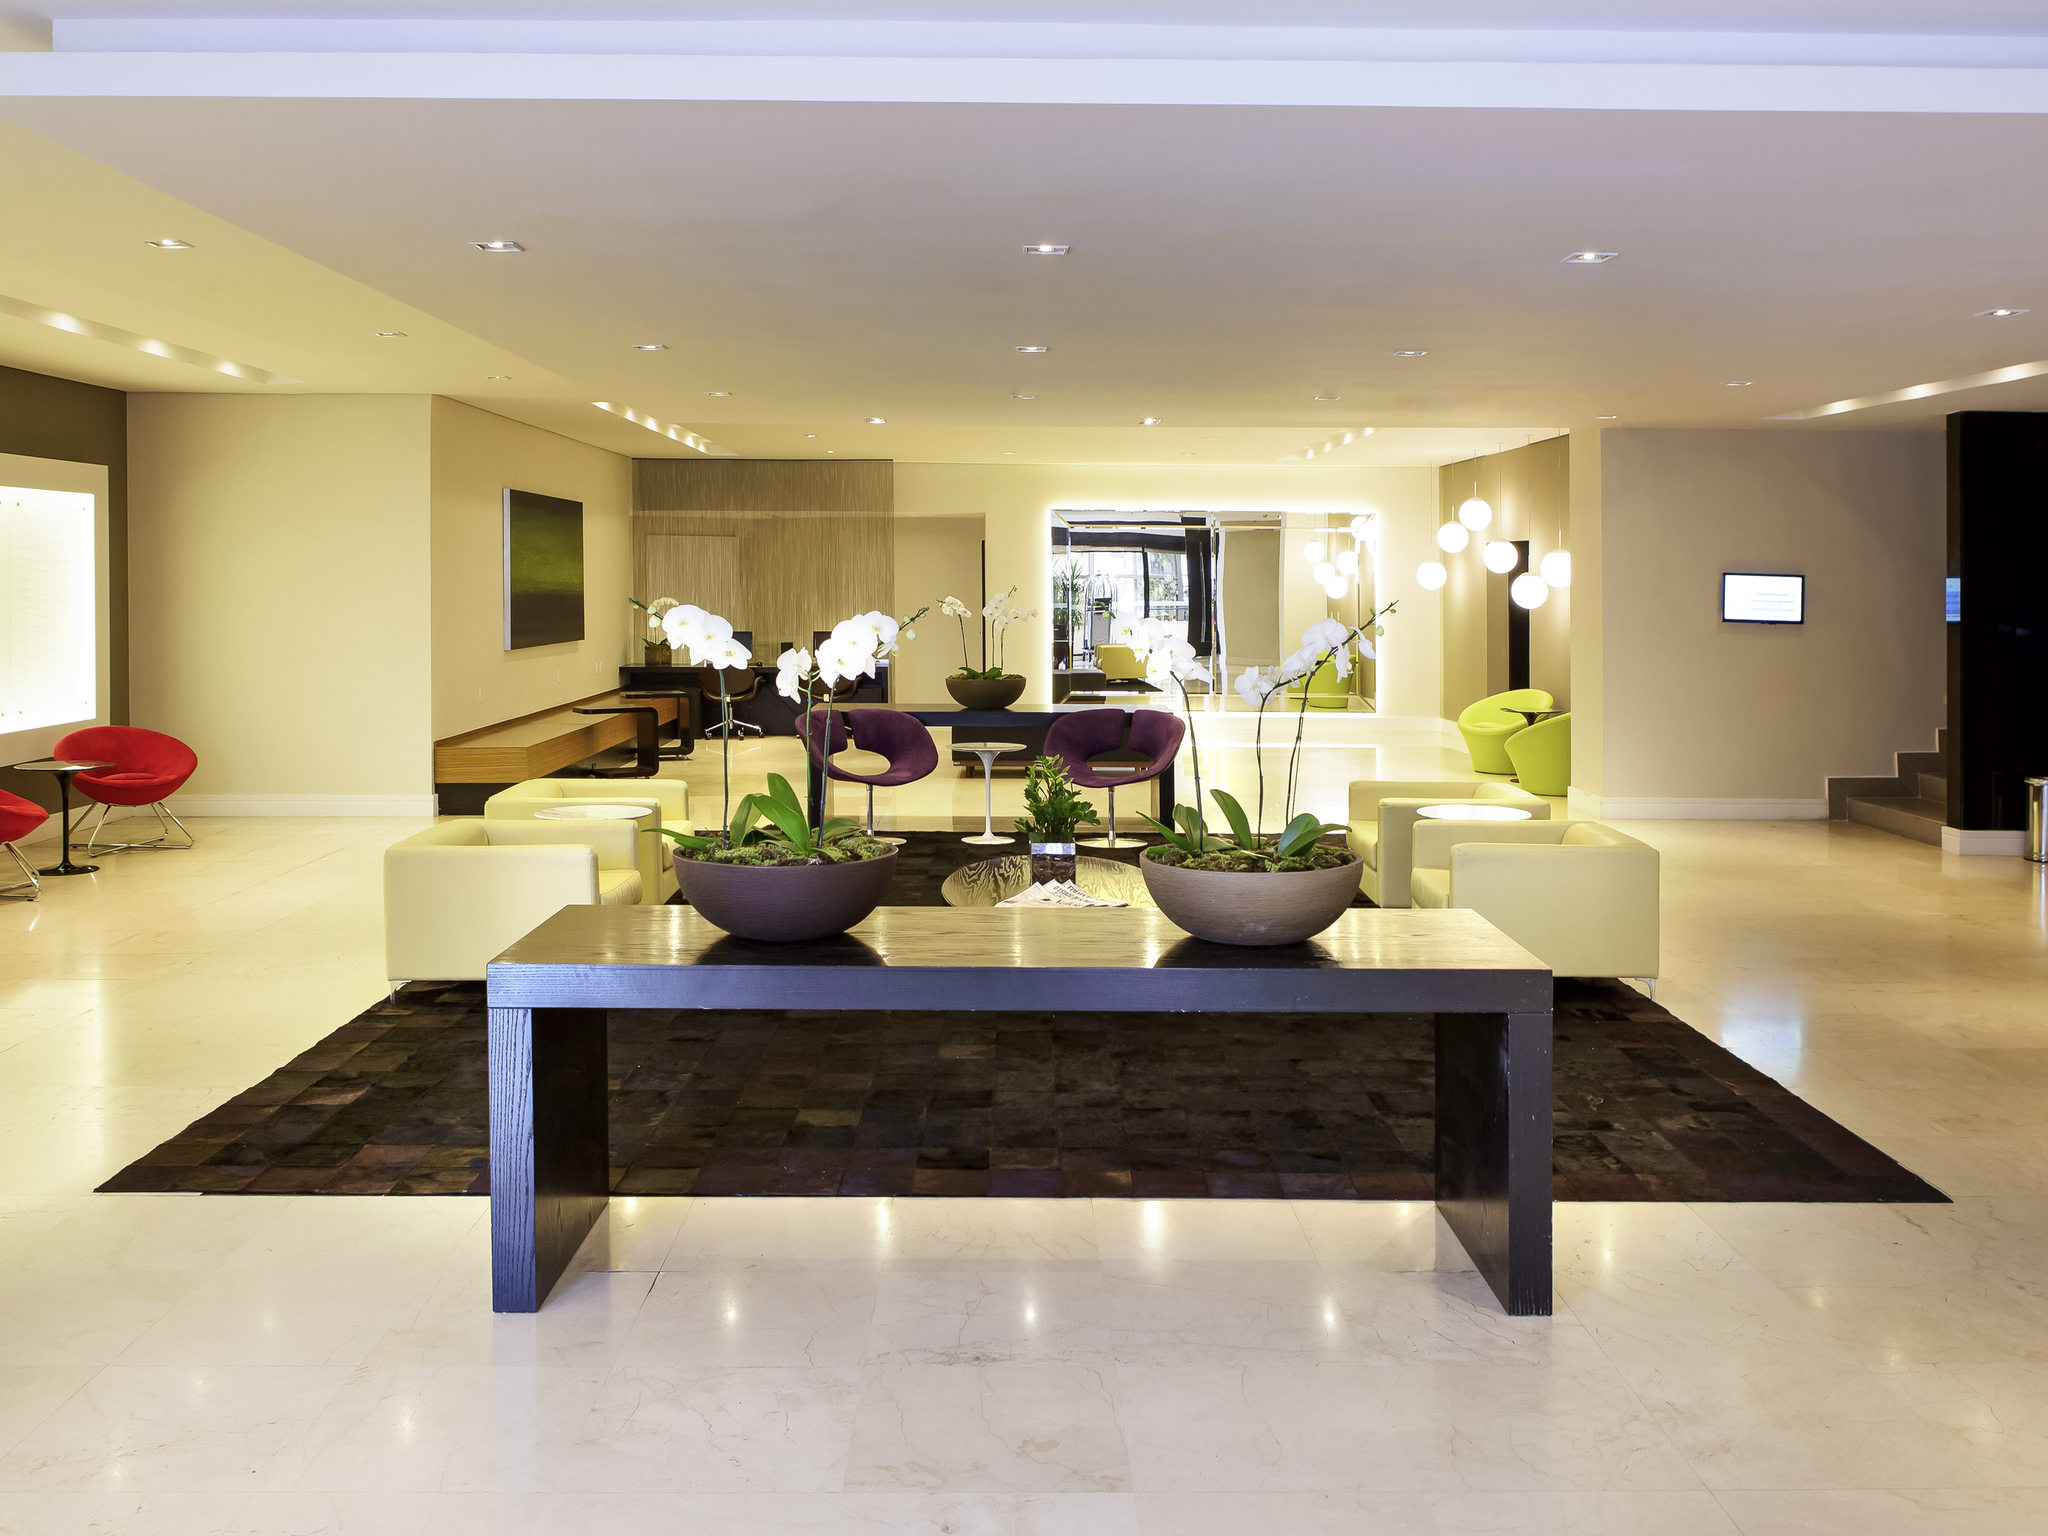 فندق - Hotel Belas Artes SP Paulista - Managed by AccorHotels